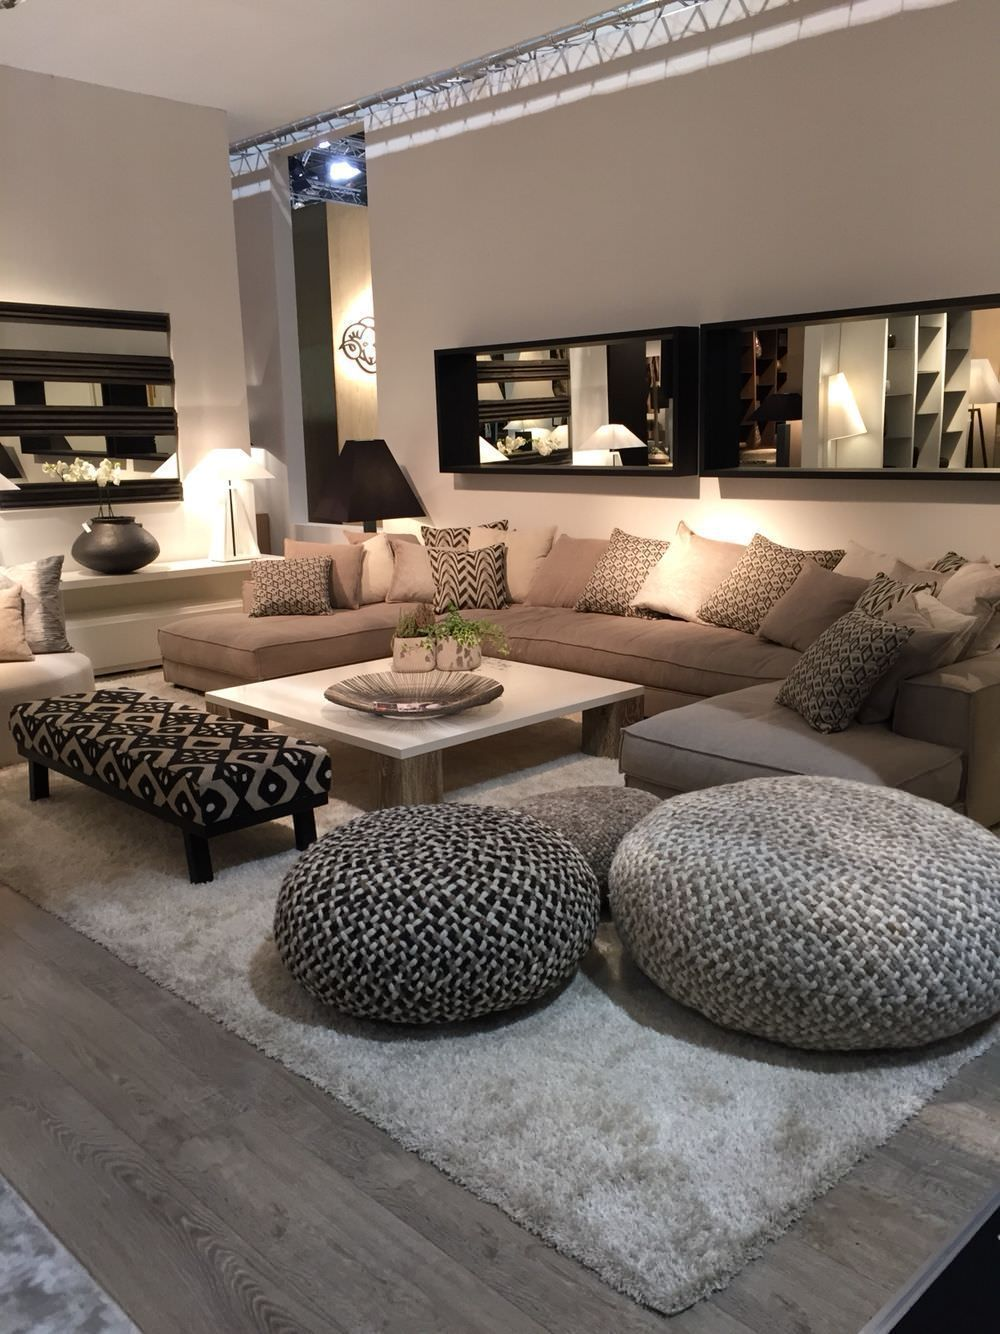 Luxury Living Rooms Ideas Luxurylivingroomdesign Black Luxury Living Roompinned In 2020 Living Room Design Modern Home Interior Design Interior Design Living Room